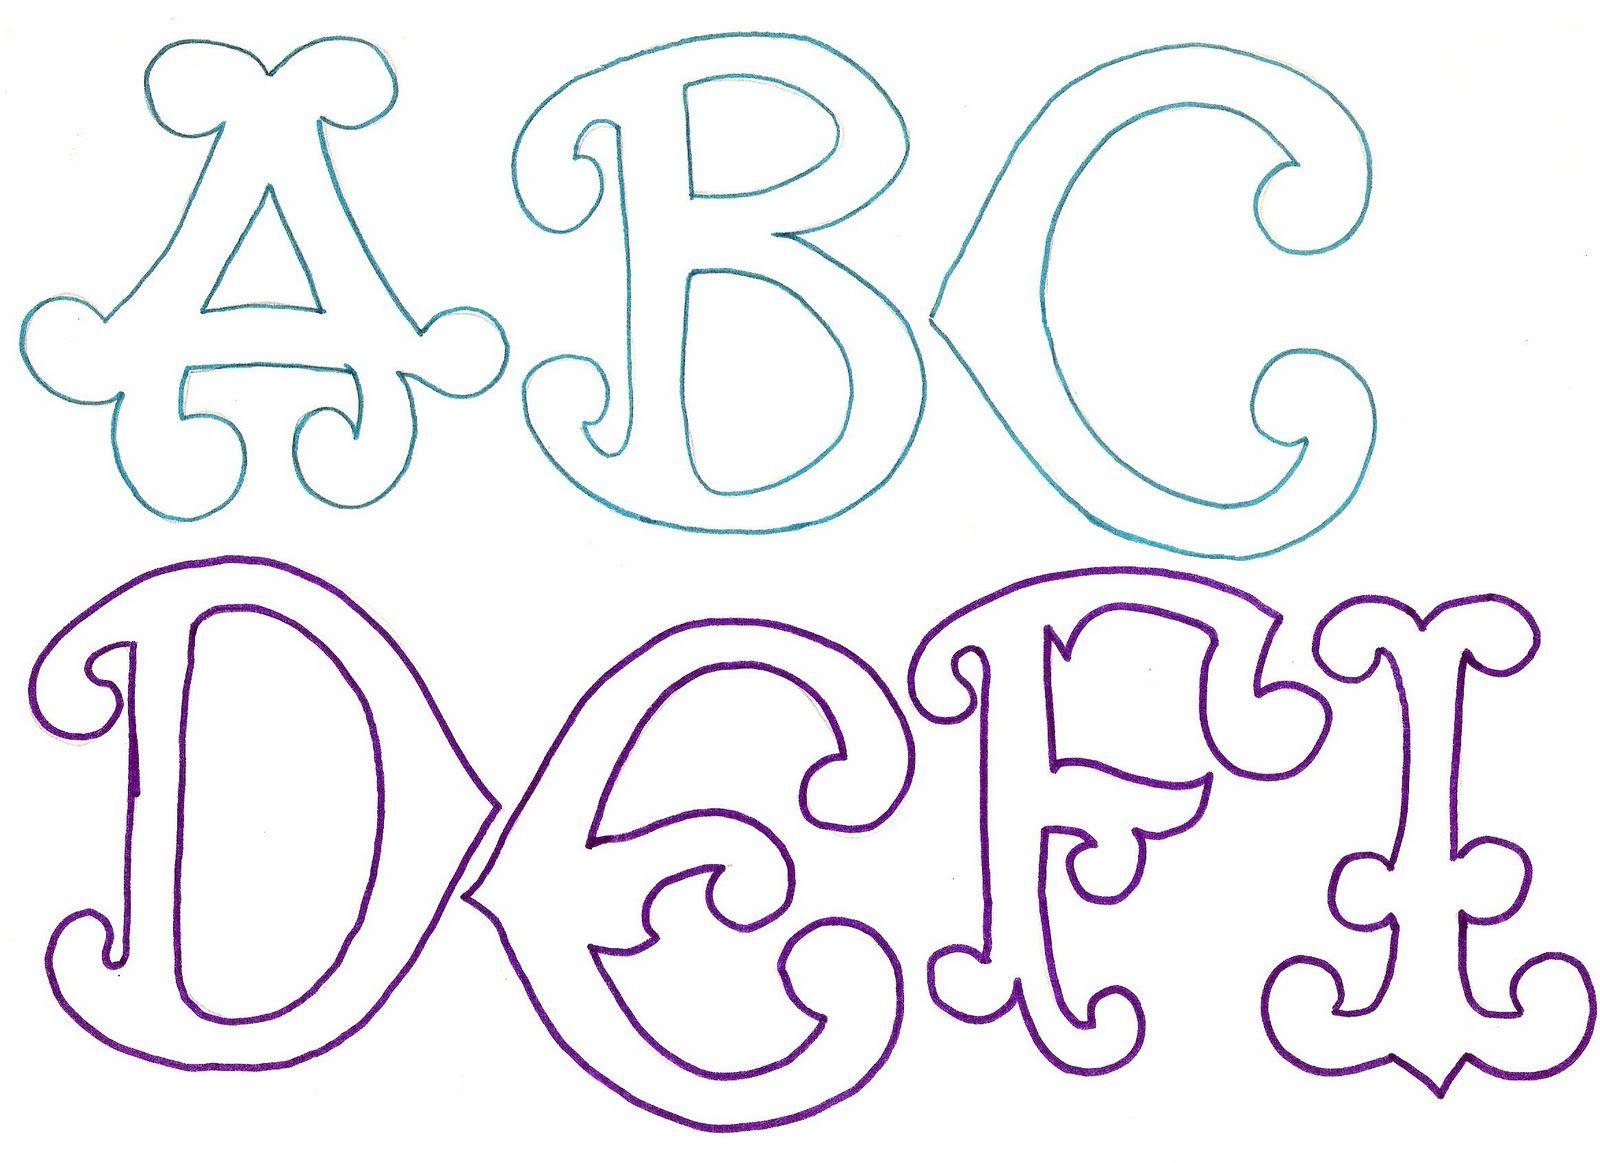 Moldes de letras DEL abecedario PARA CARTELES - Imagui | docencia ...